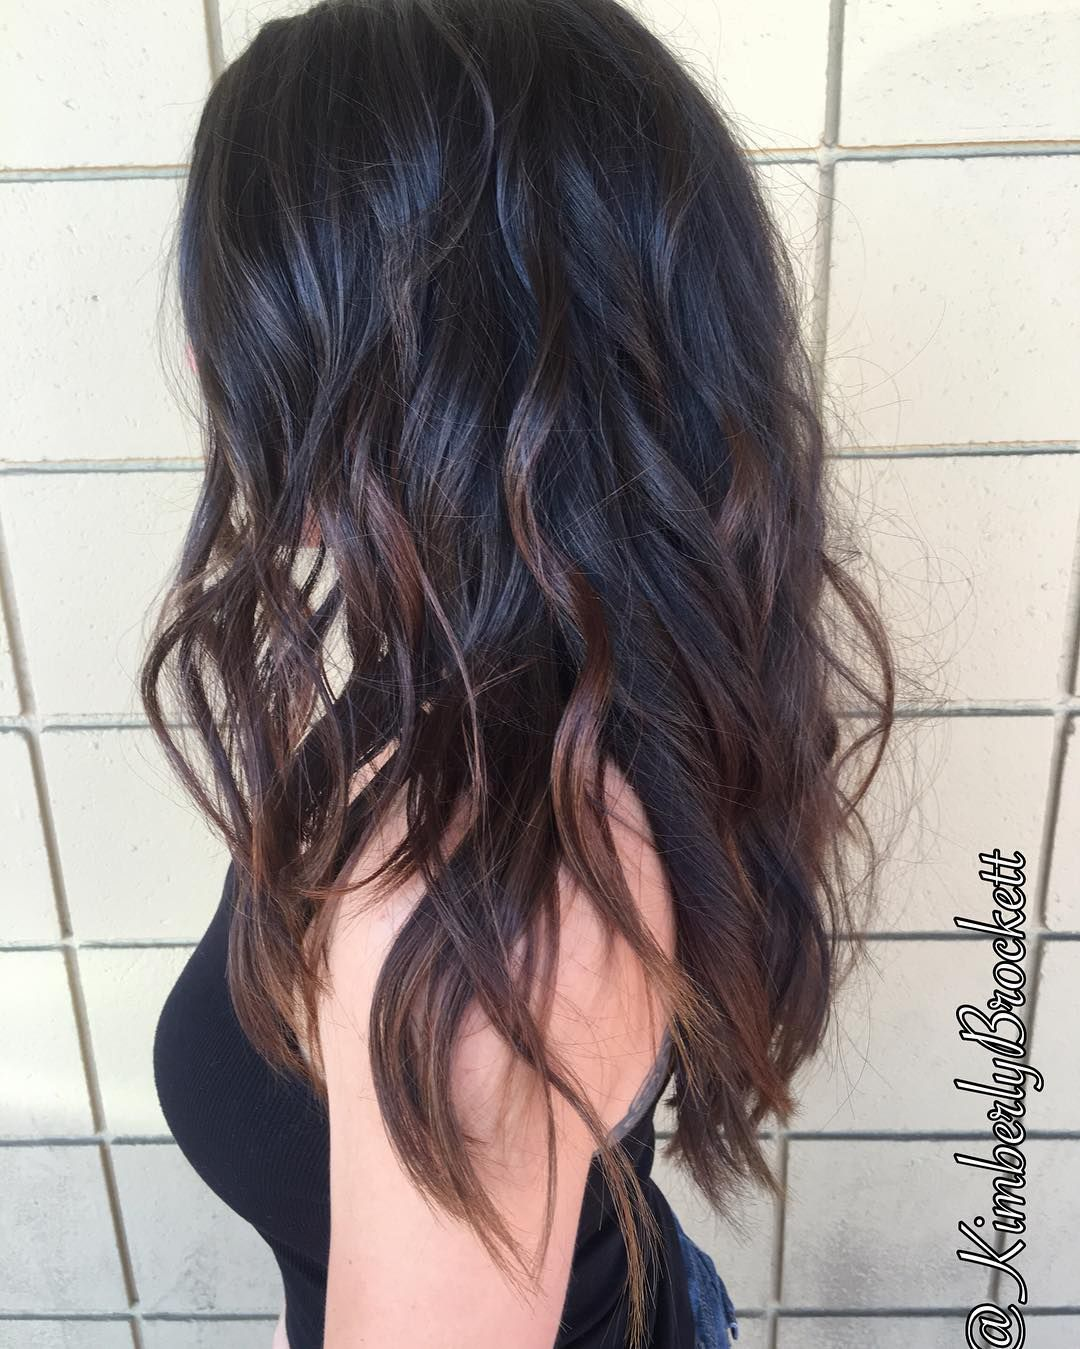 Wavy Black Long Layered Hair With Chocolate Brown Balayage Hair Styles Long Layered Hair Balayage Hair